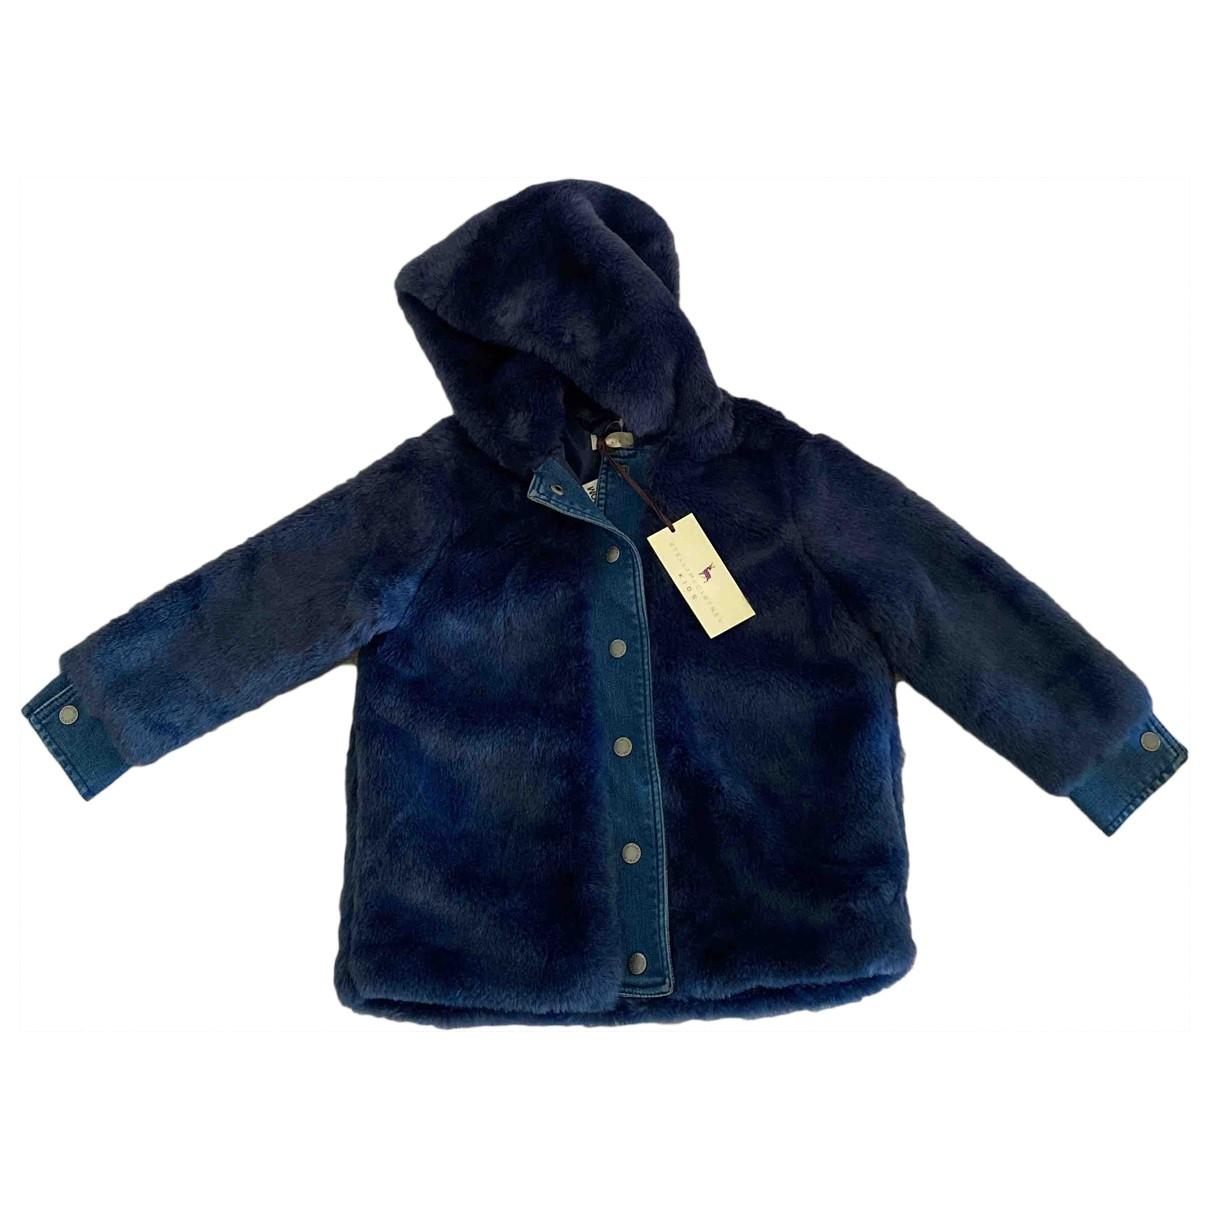 Stella Mccartney \N Blue Faux fur jacket & coat for Kids 5 years - until 42.5 inches UK